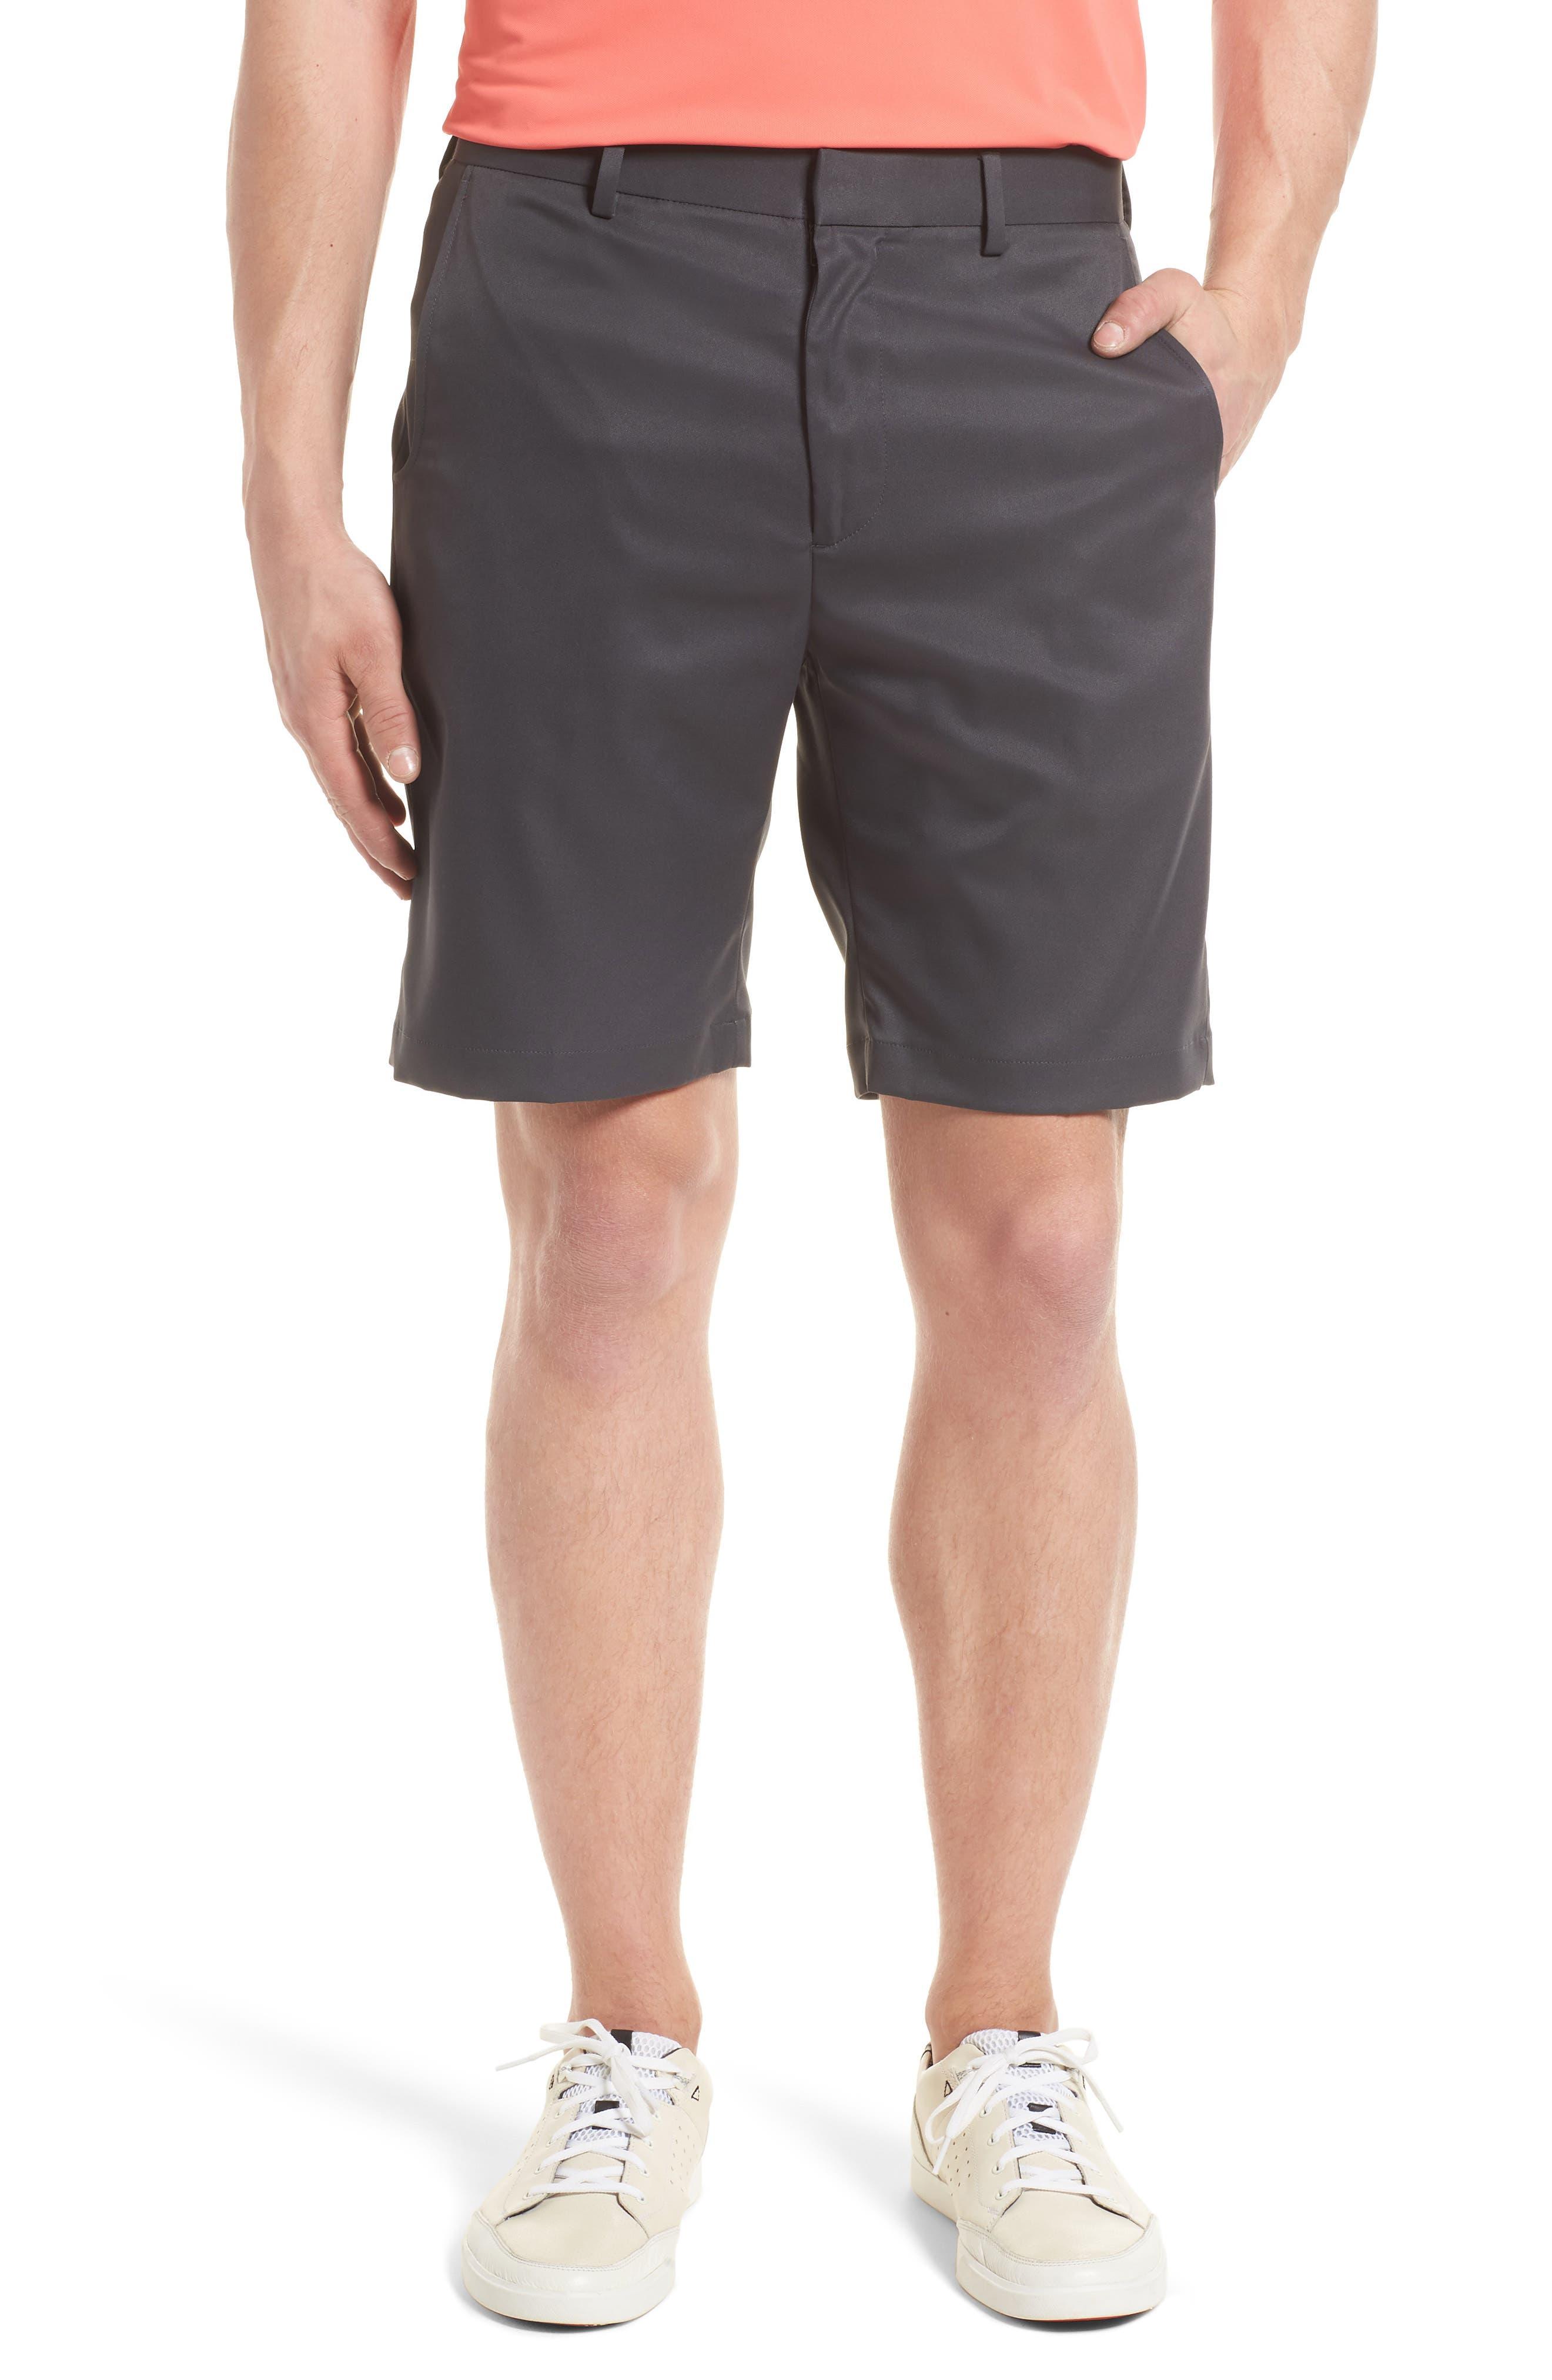 BOBBY JONES Flat Front Tech Shorts, Main, color, CHARCOAL